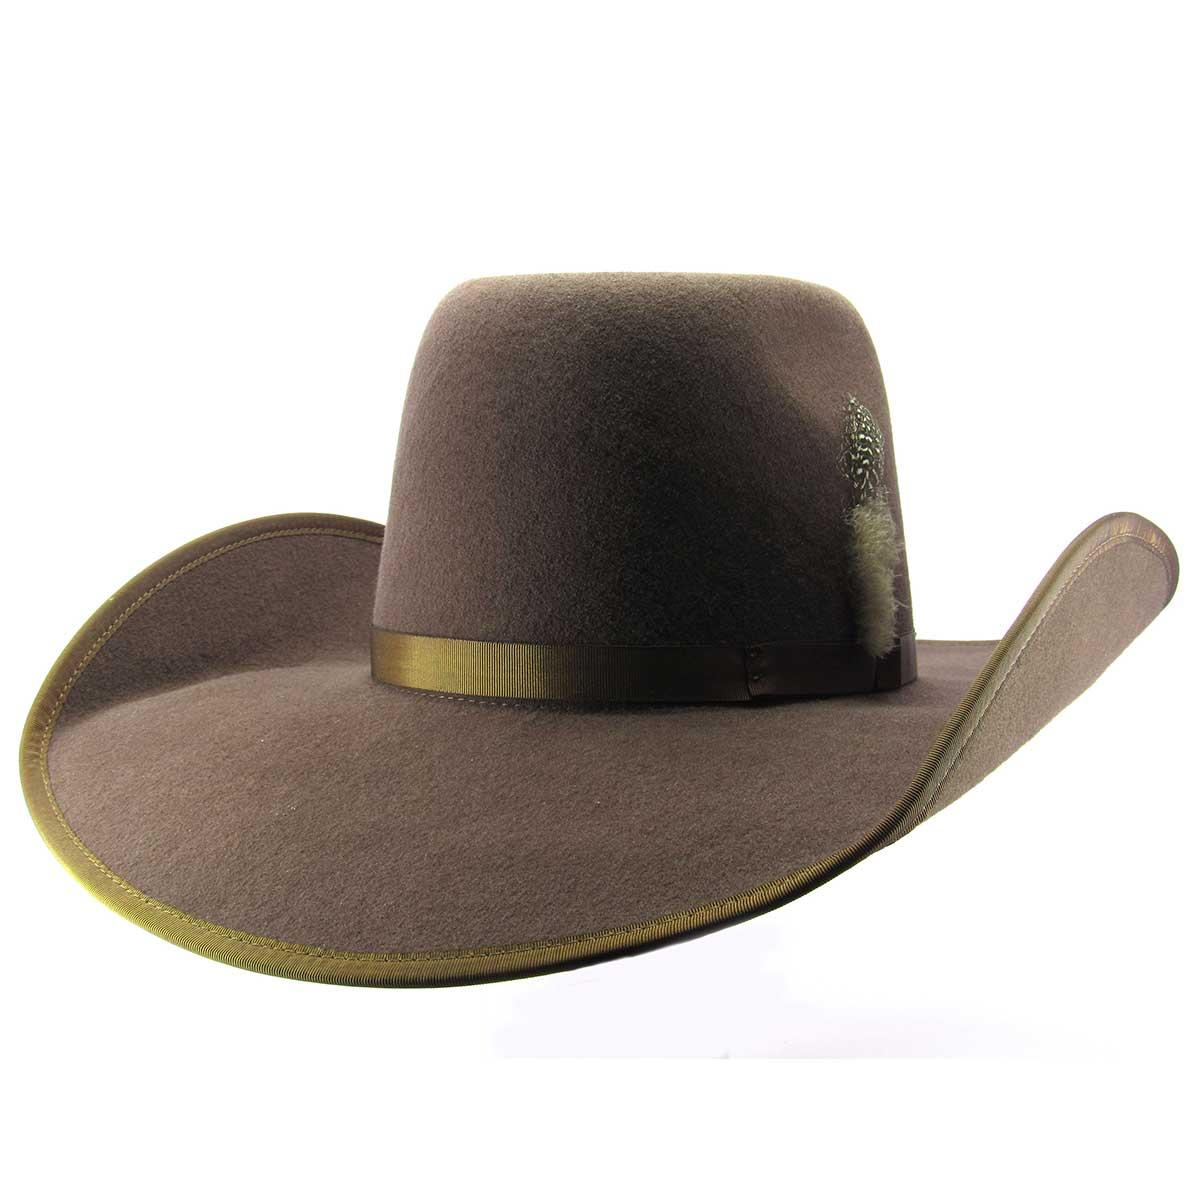 c83d53c577906 Chapéu Pralana Champion Bull Rider Marrom Country Aba 12 - Cowboy BR